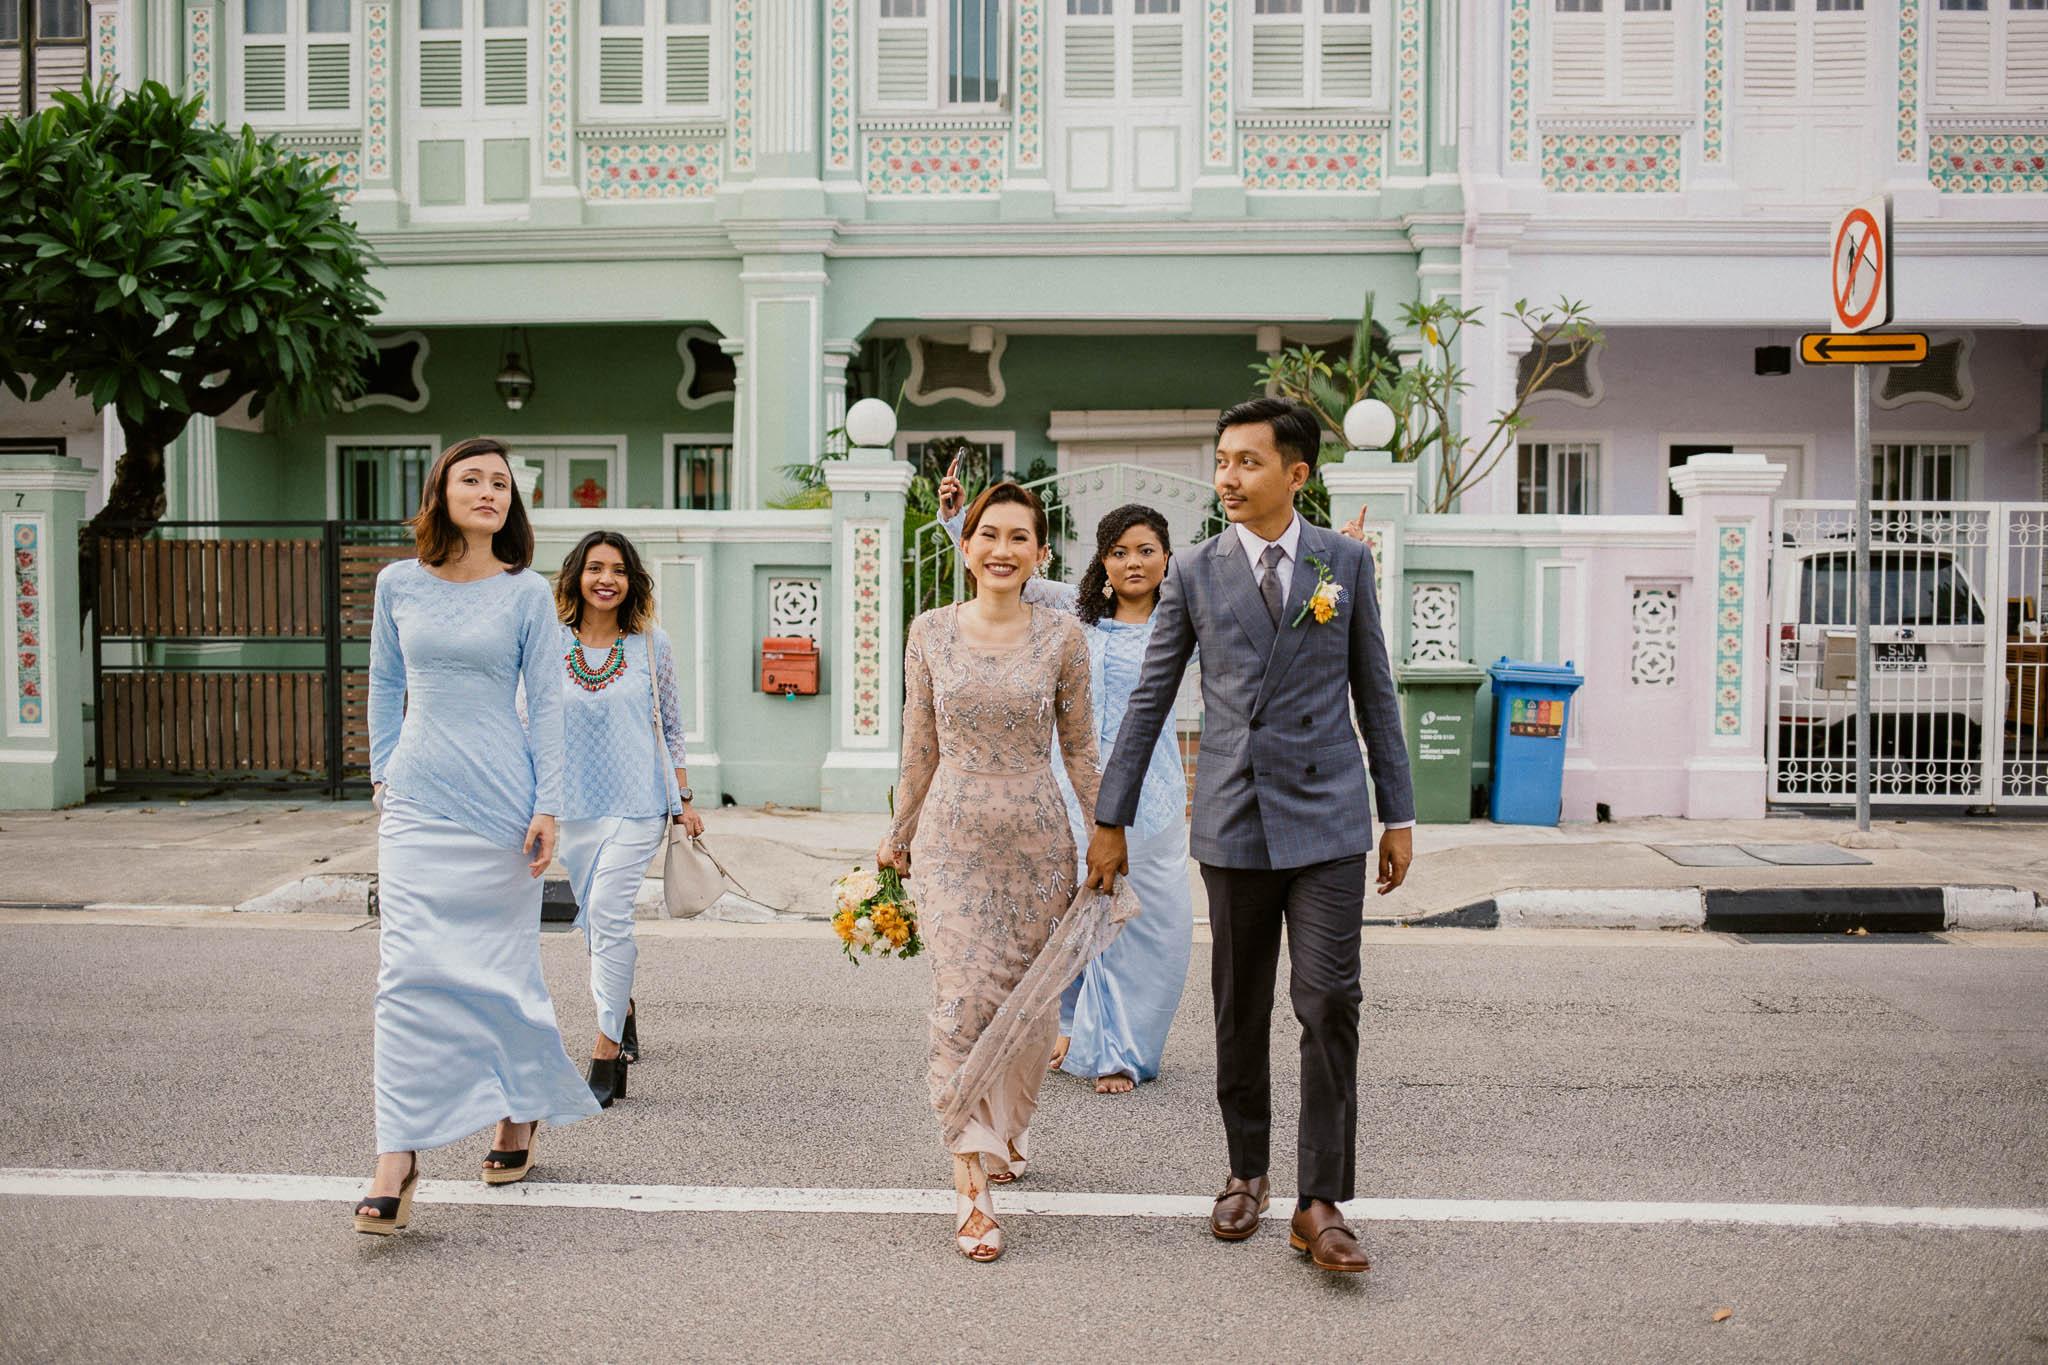 singapore-wedding-photographer-addafiq-nufail-078.jpg